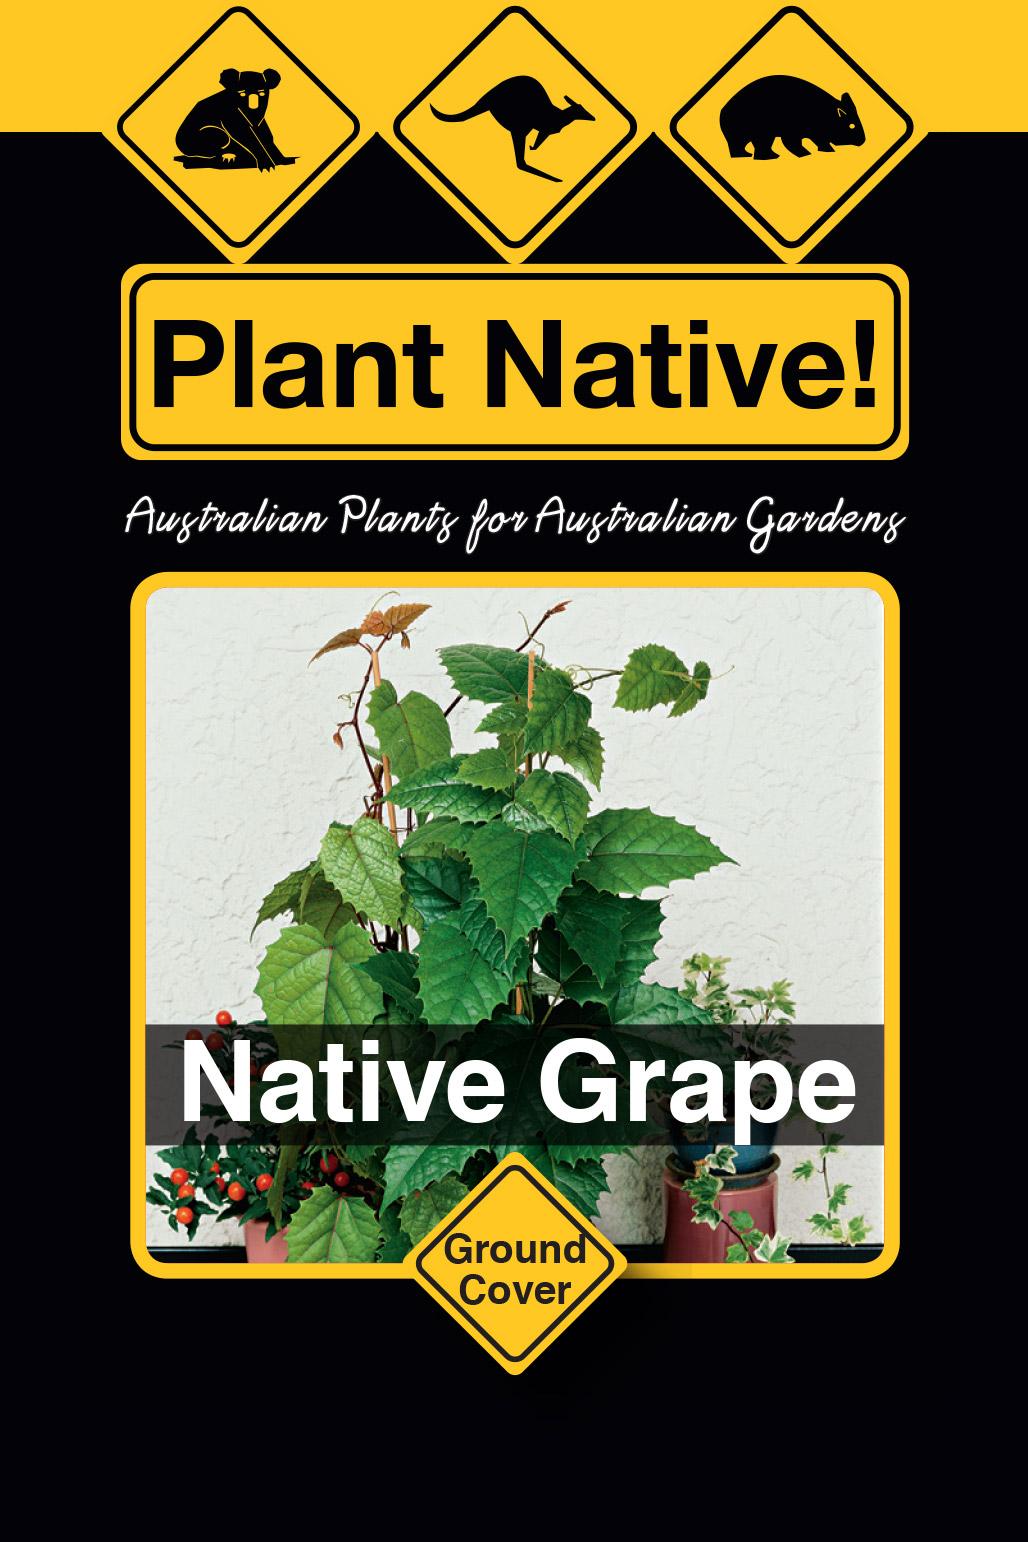 Native Grape - Plant Native!